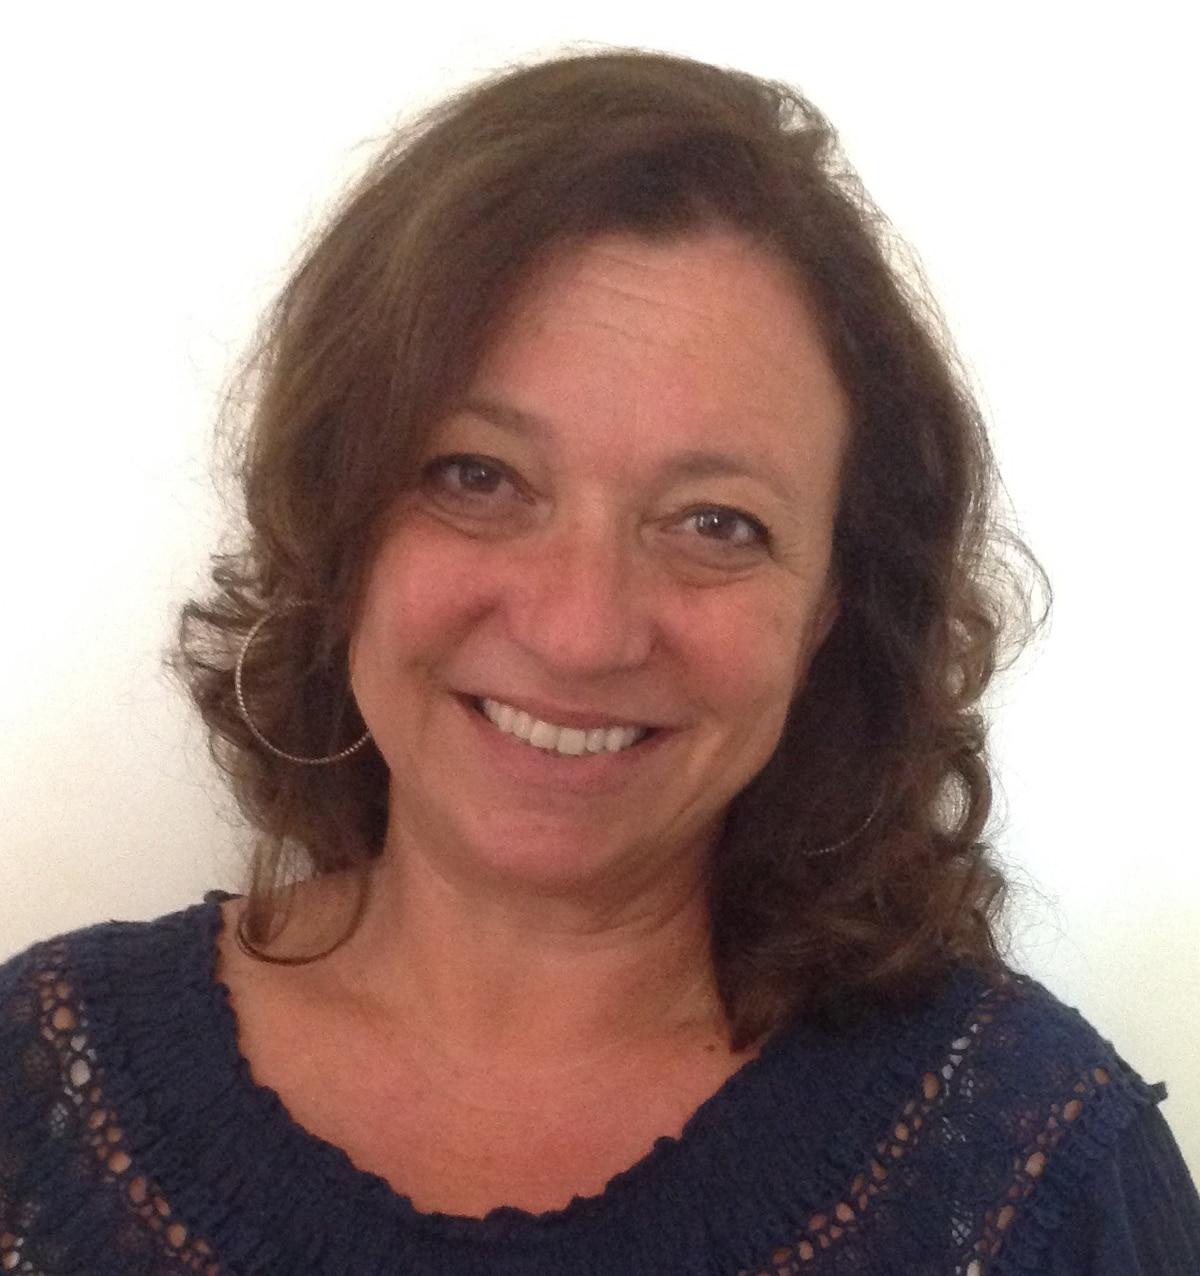 Francesca from Genoa